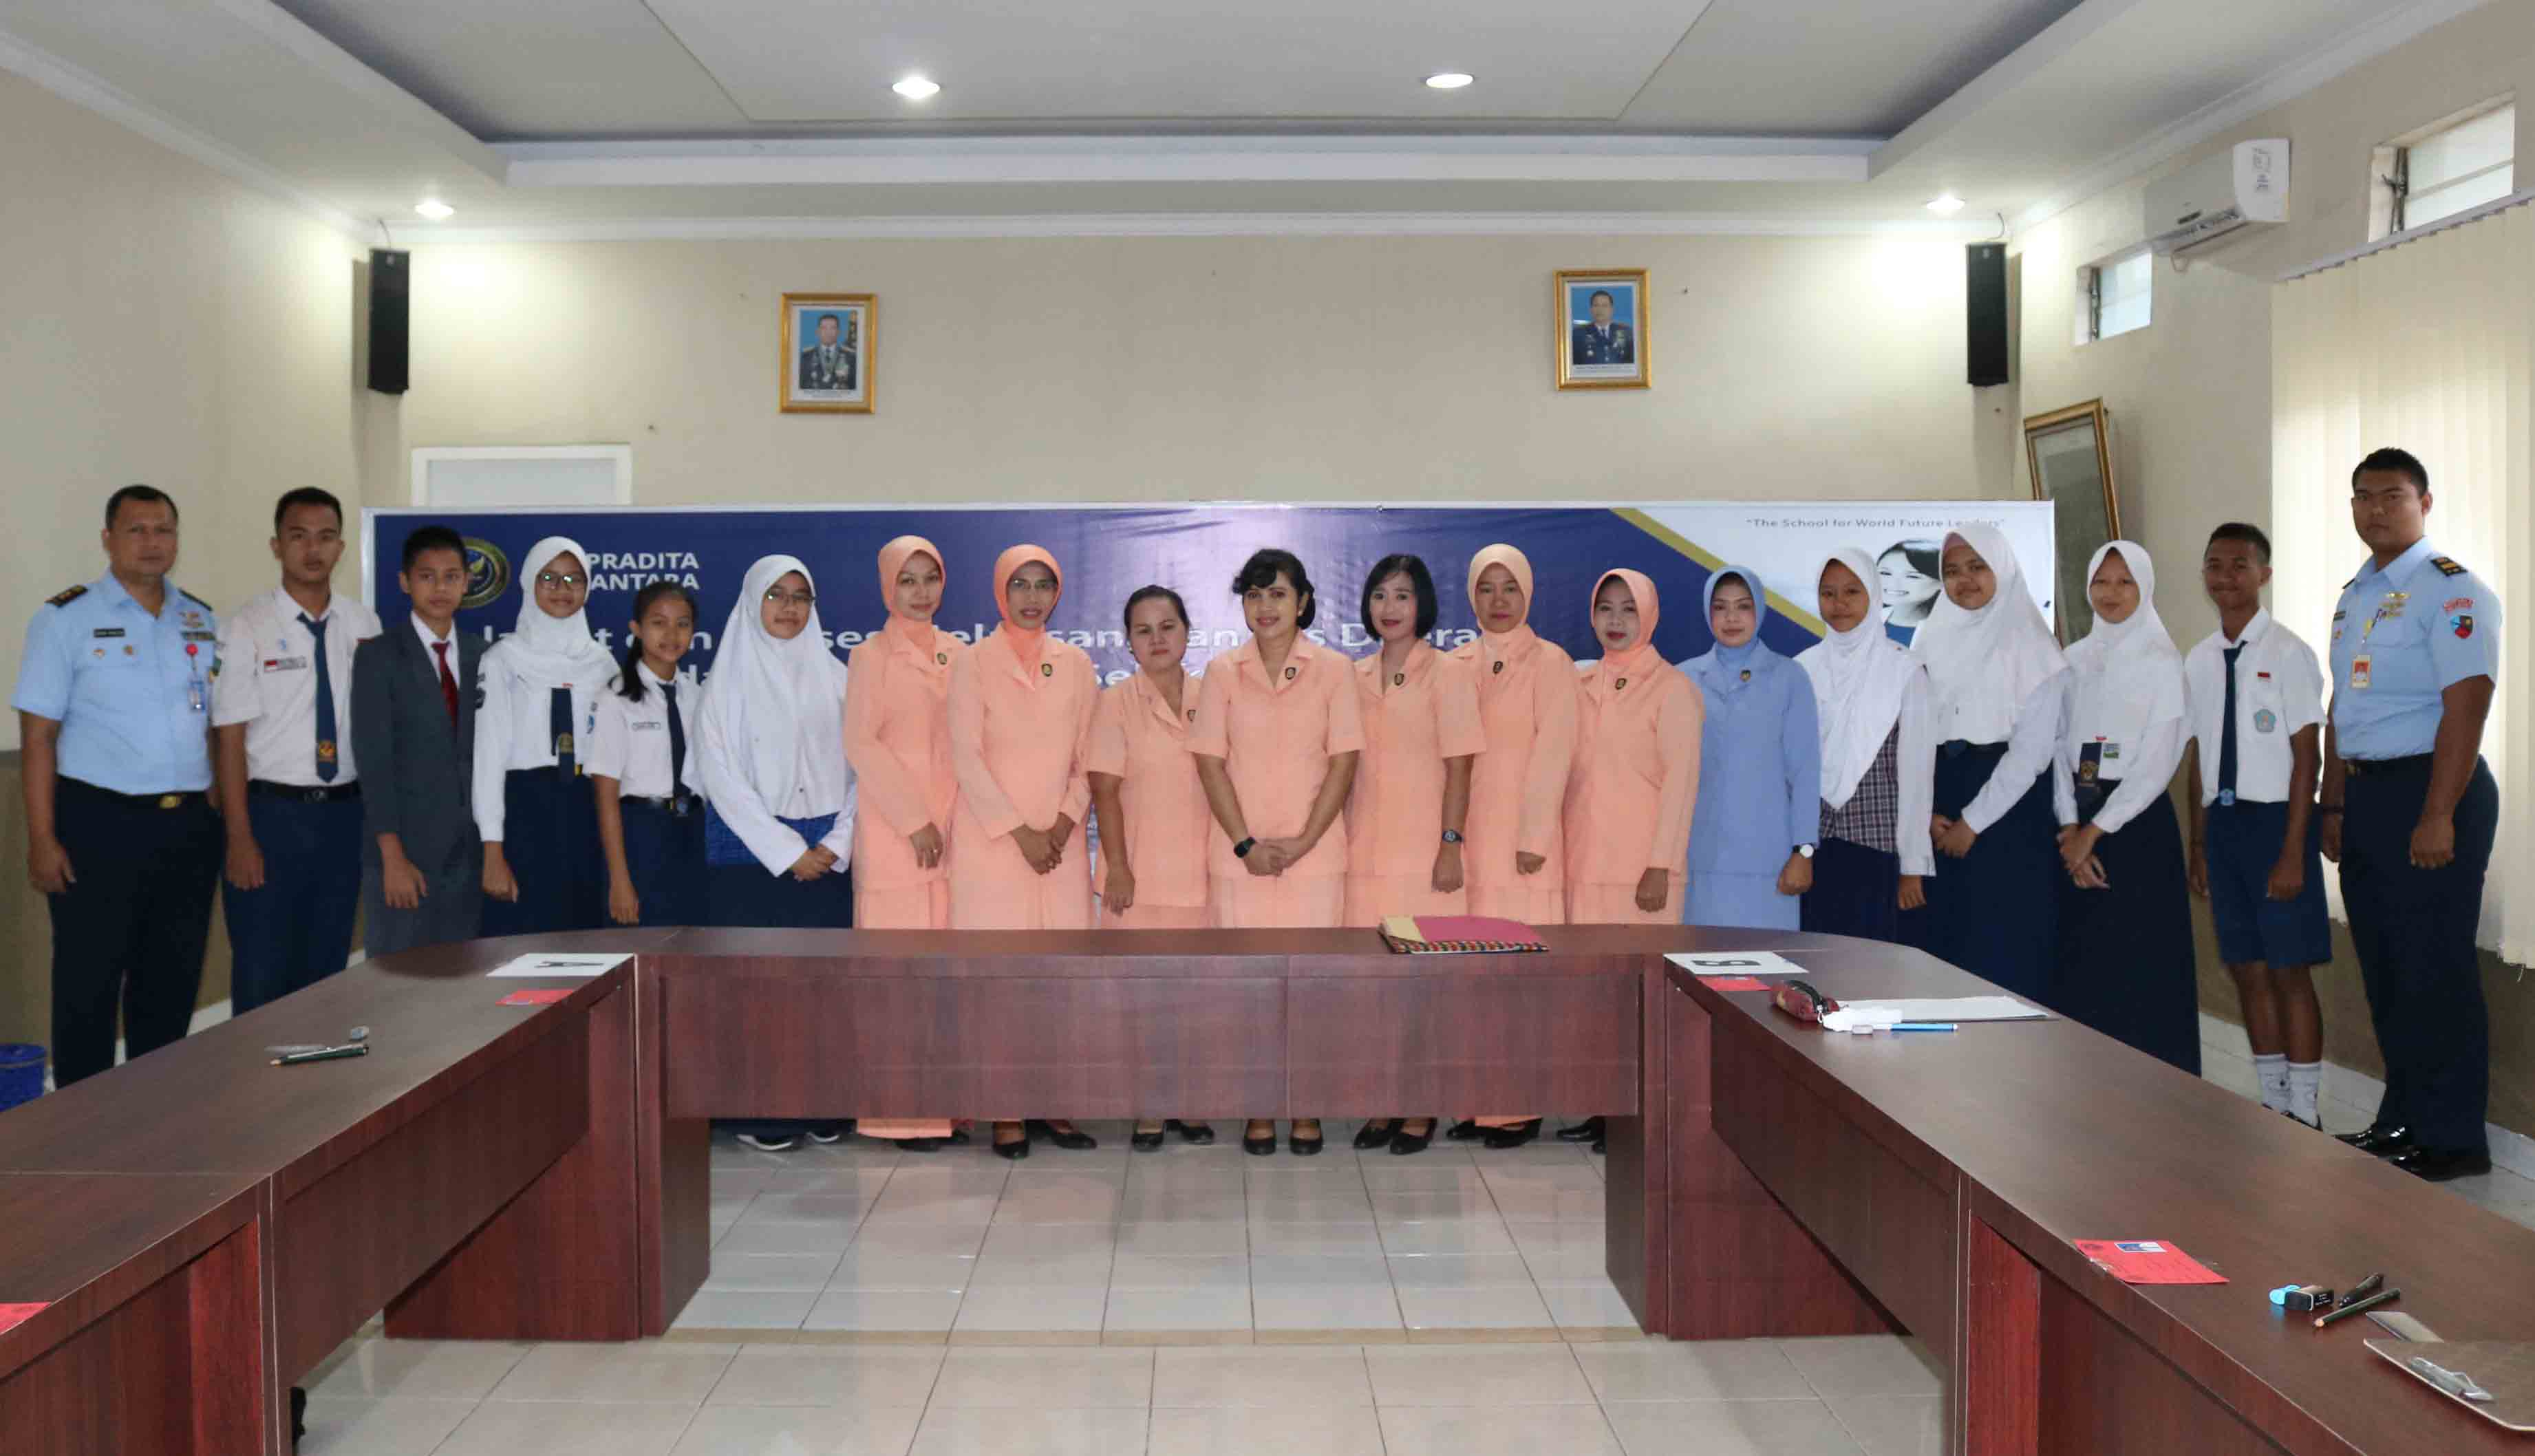 Ketua Yasarini Cab. Lanud SMH Seleksi Putra-Putri Calon SMA Pradita Dirgantara